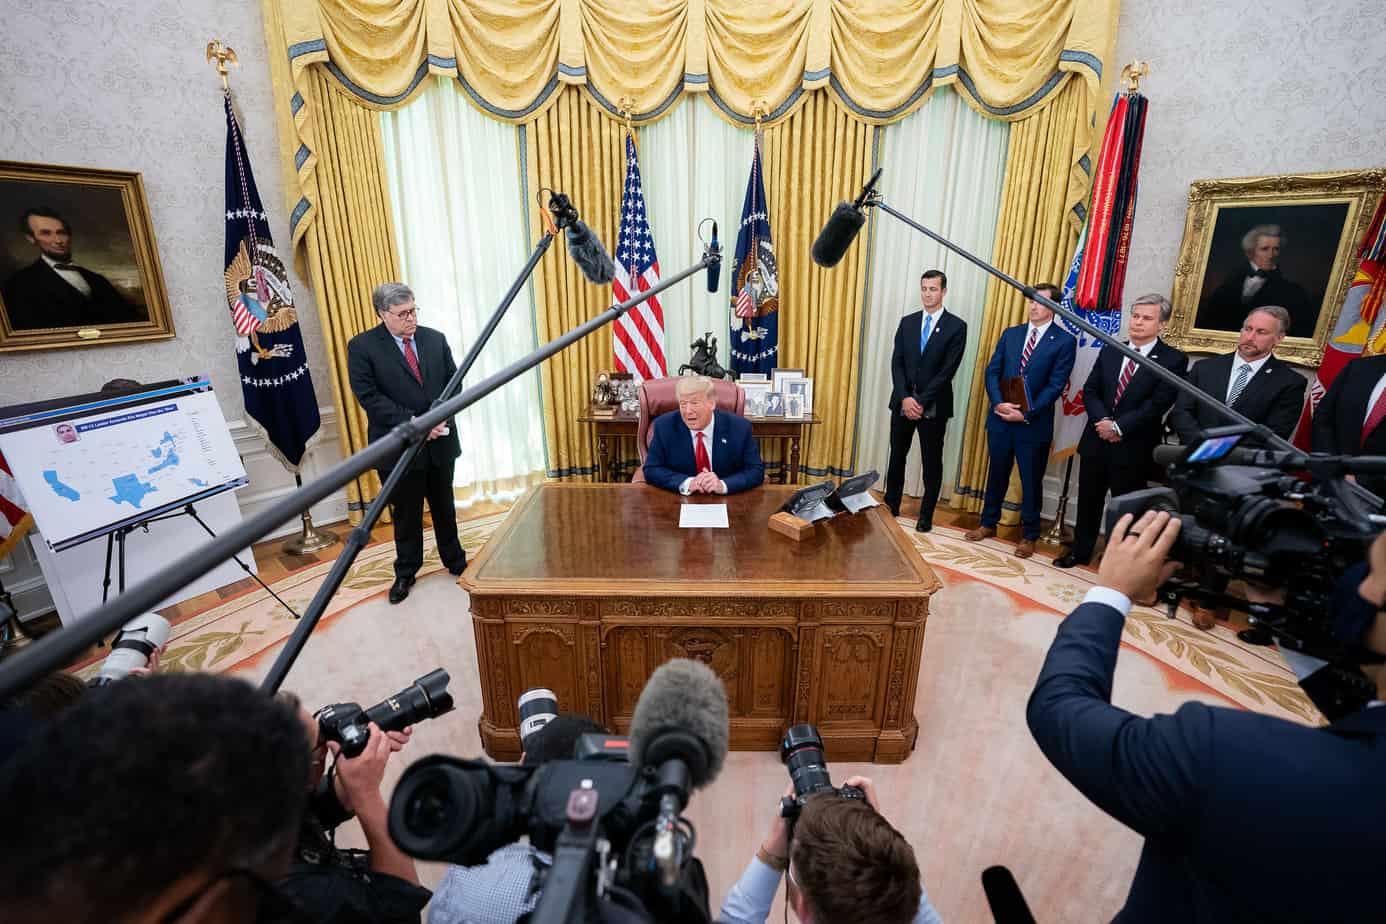 Trump Administration Accomplishments